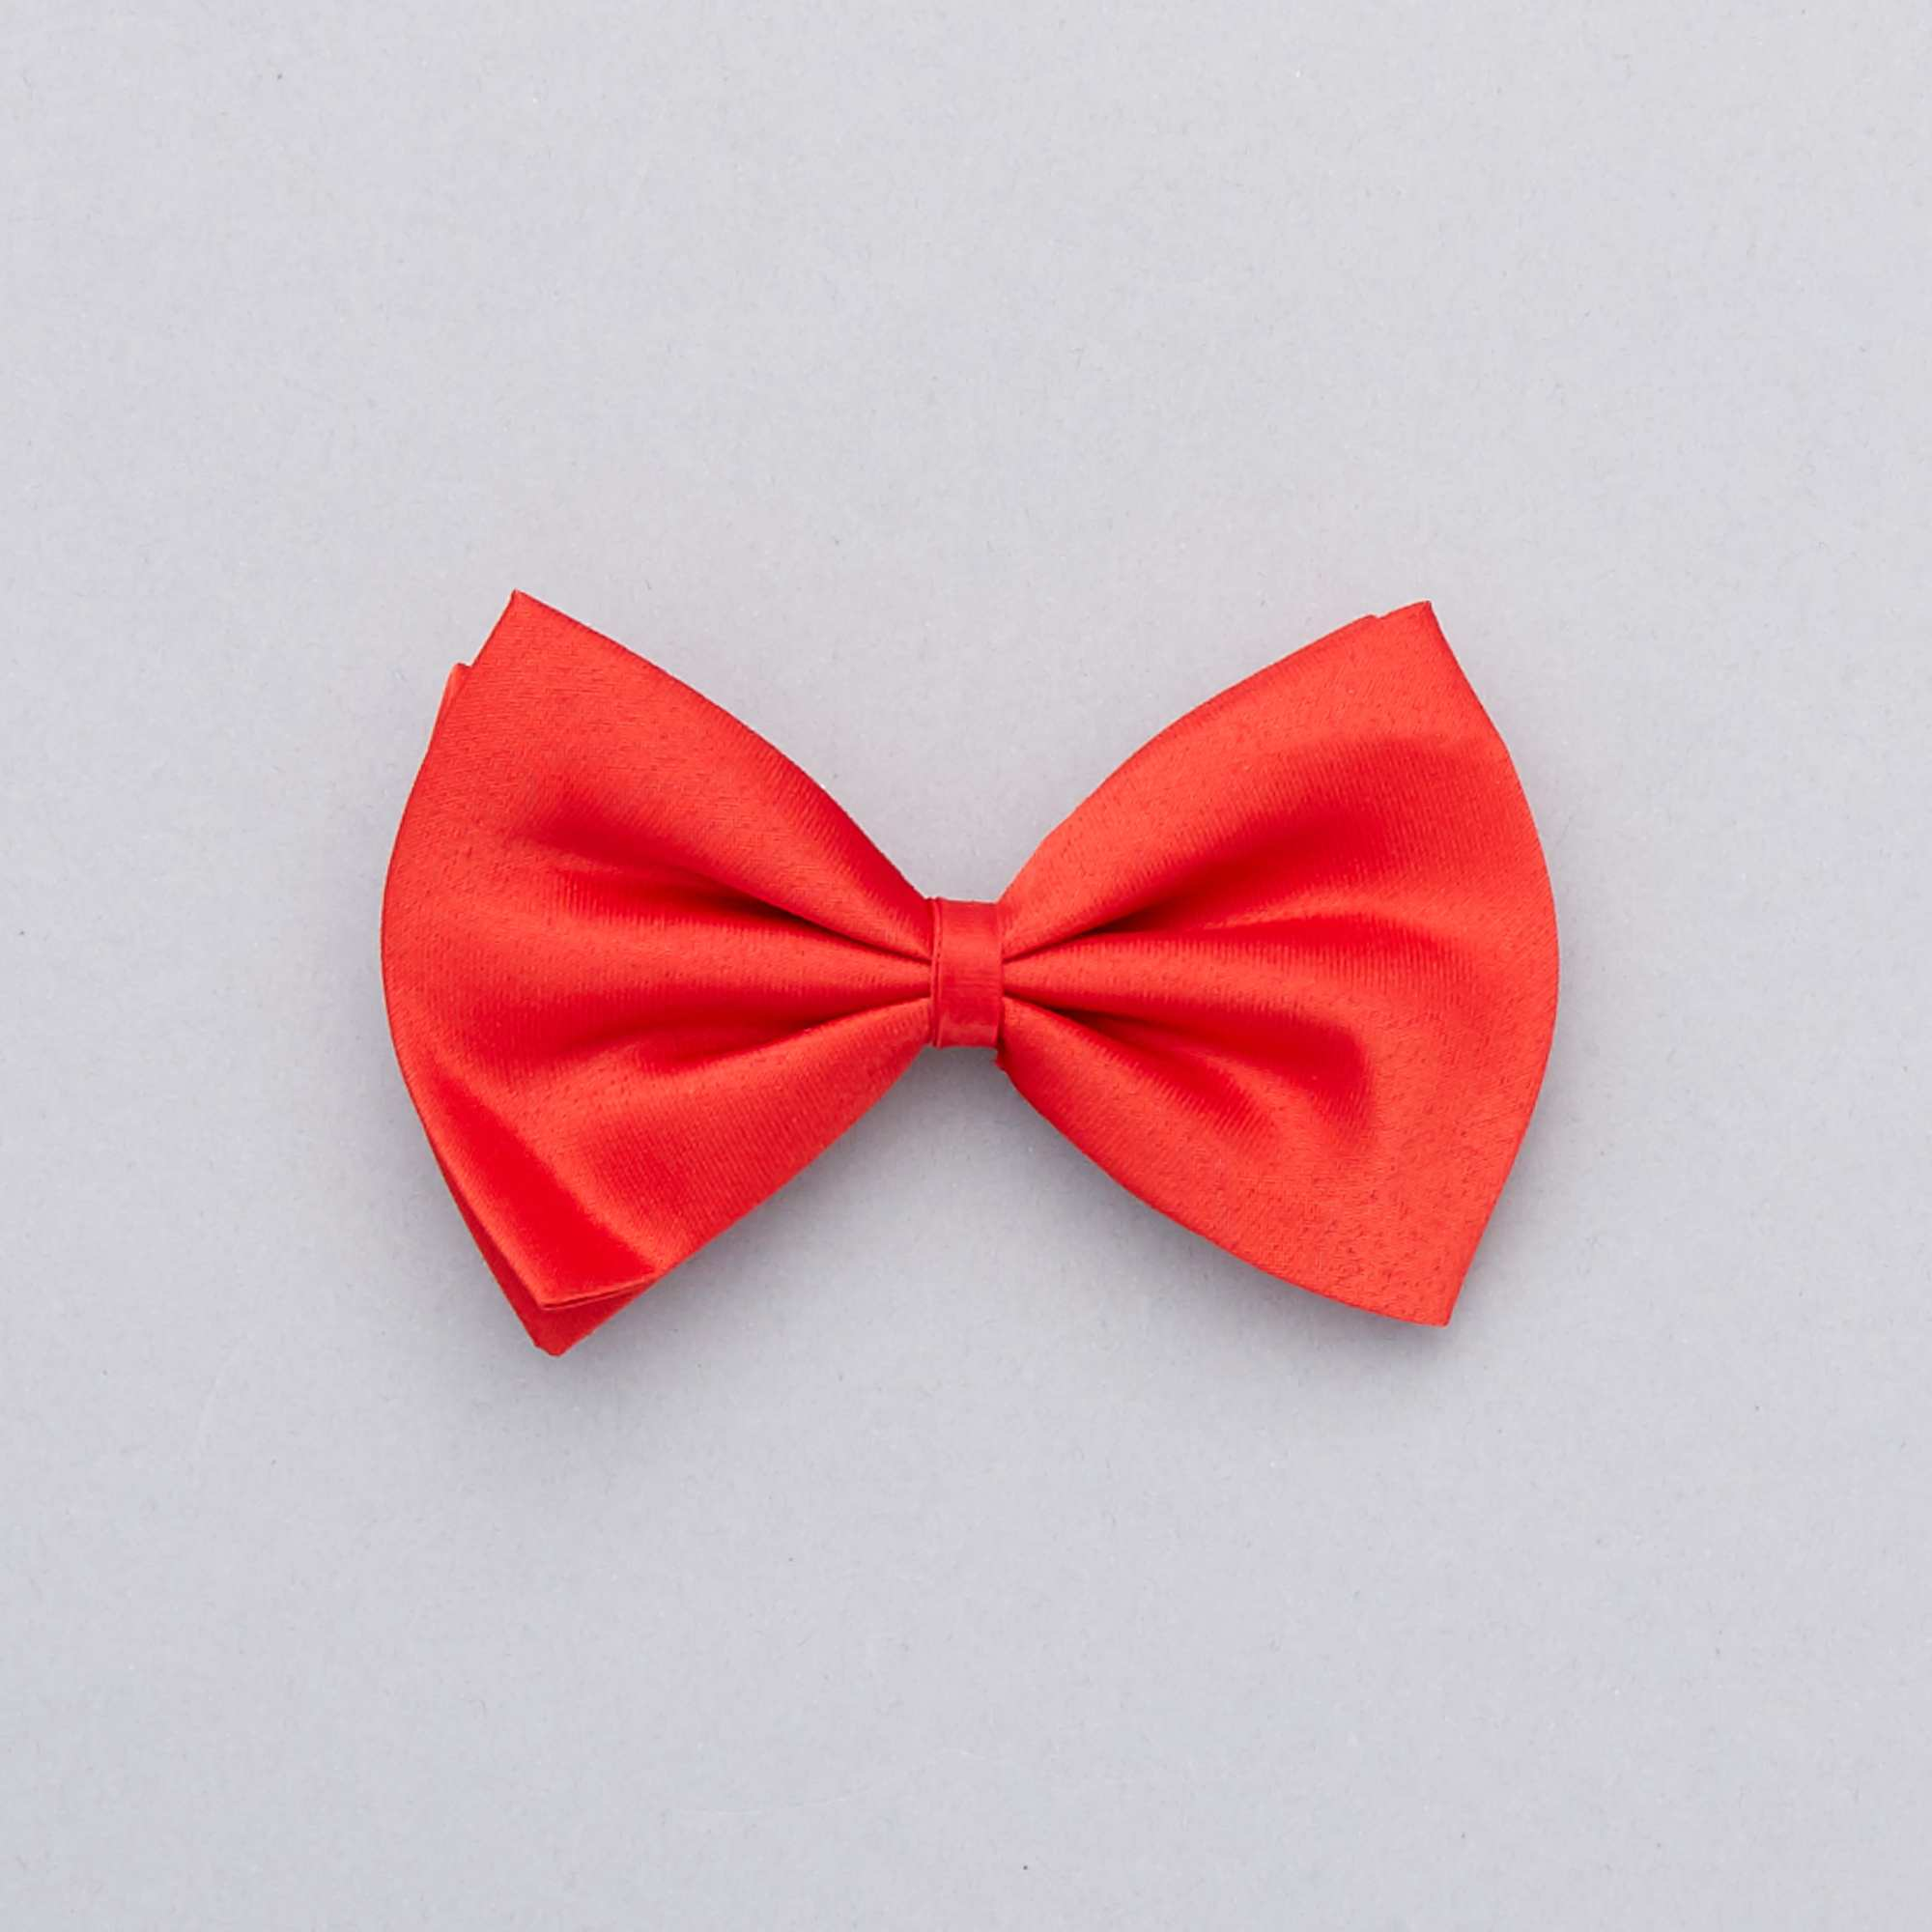 noeud papillon uni accessoires rouge kiabi 1 50. Black Bedroom Furniture Sets. Home Design Ideas